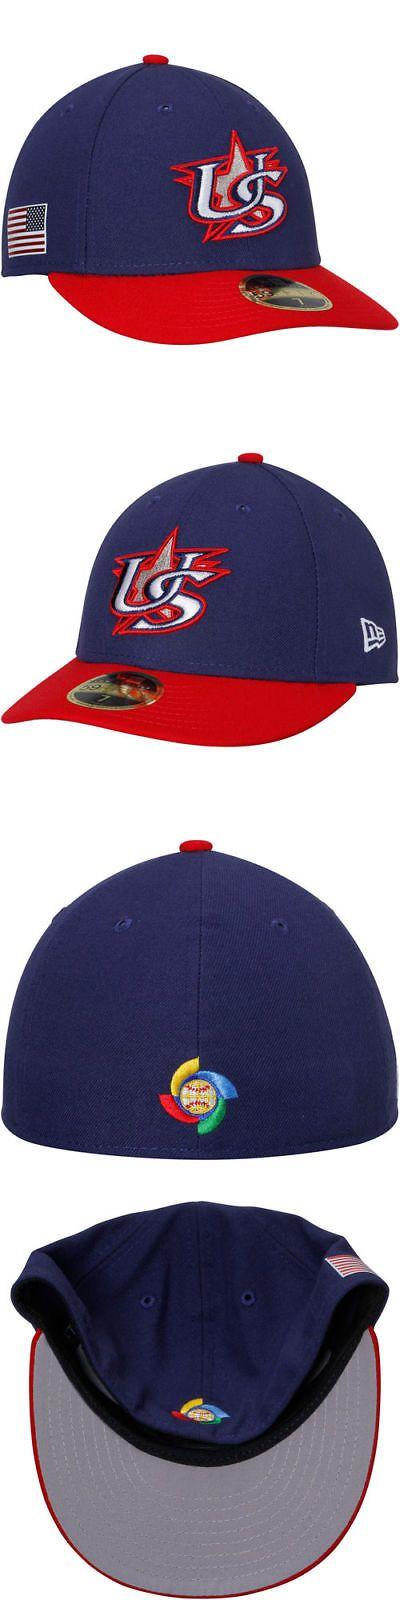 Baseball-MLB 24410: New Era Usa Baseball Fitted Hat - World Baseball Classic -> BUY IT NOW ONLY: $34.99 on eBay!